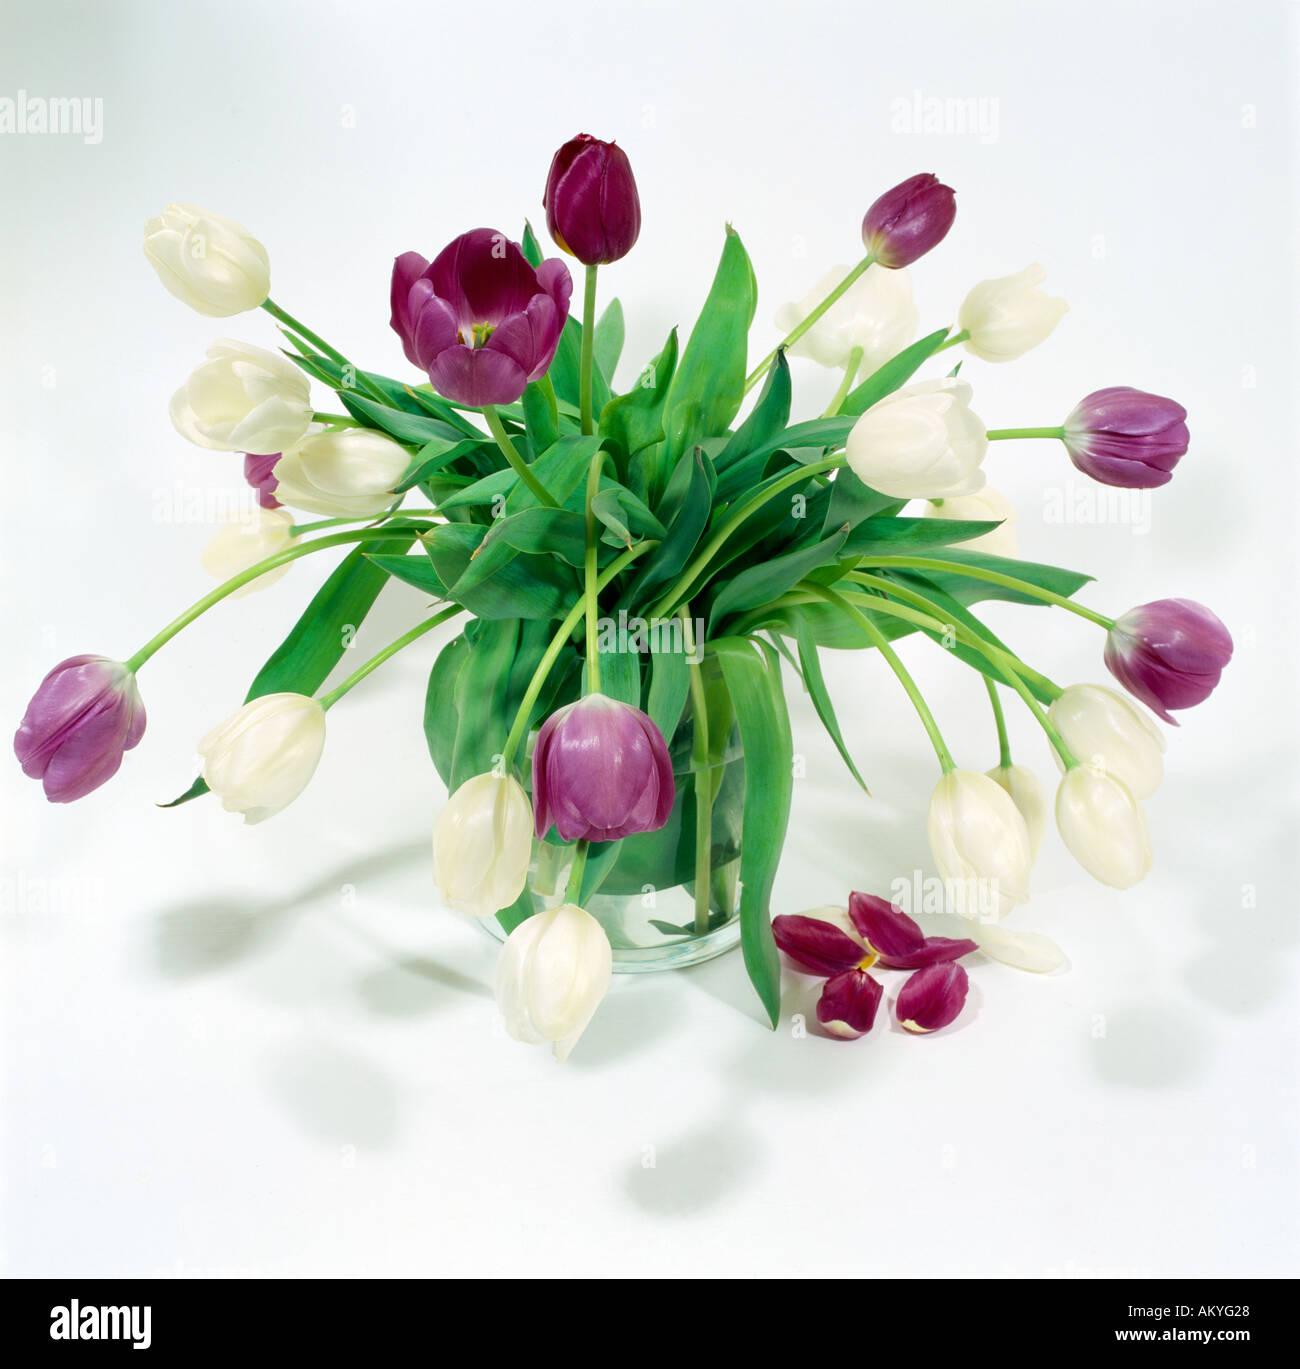 Flower arrangement white purple tulips in vase stock photo 4928551 flower arrangement white purple tulips in vase mightylinksfo